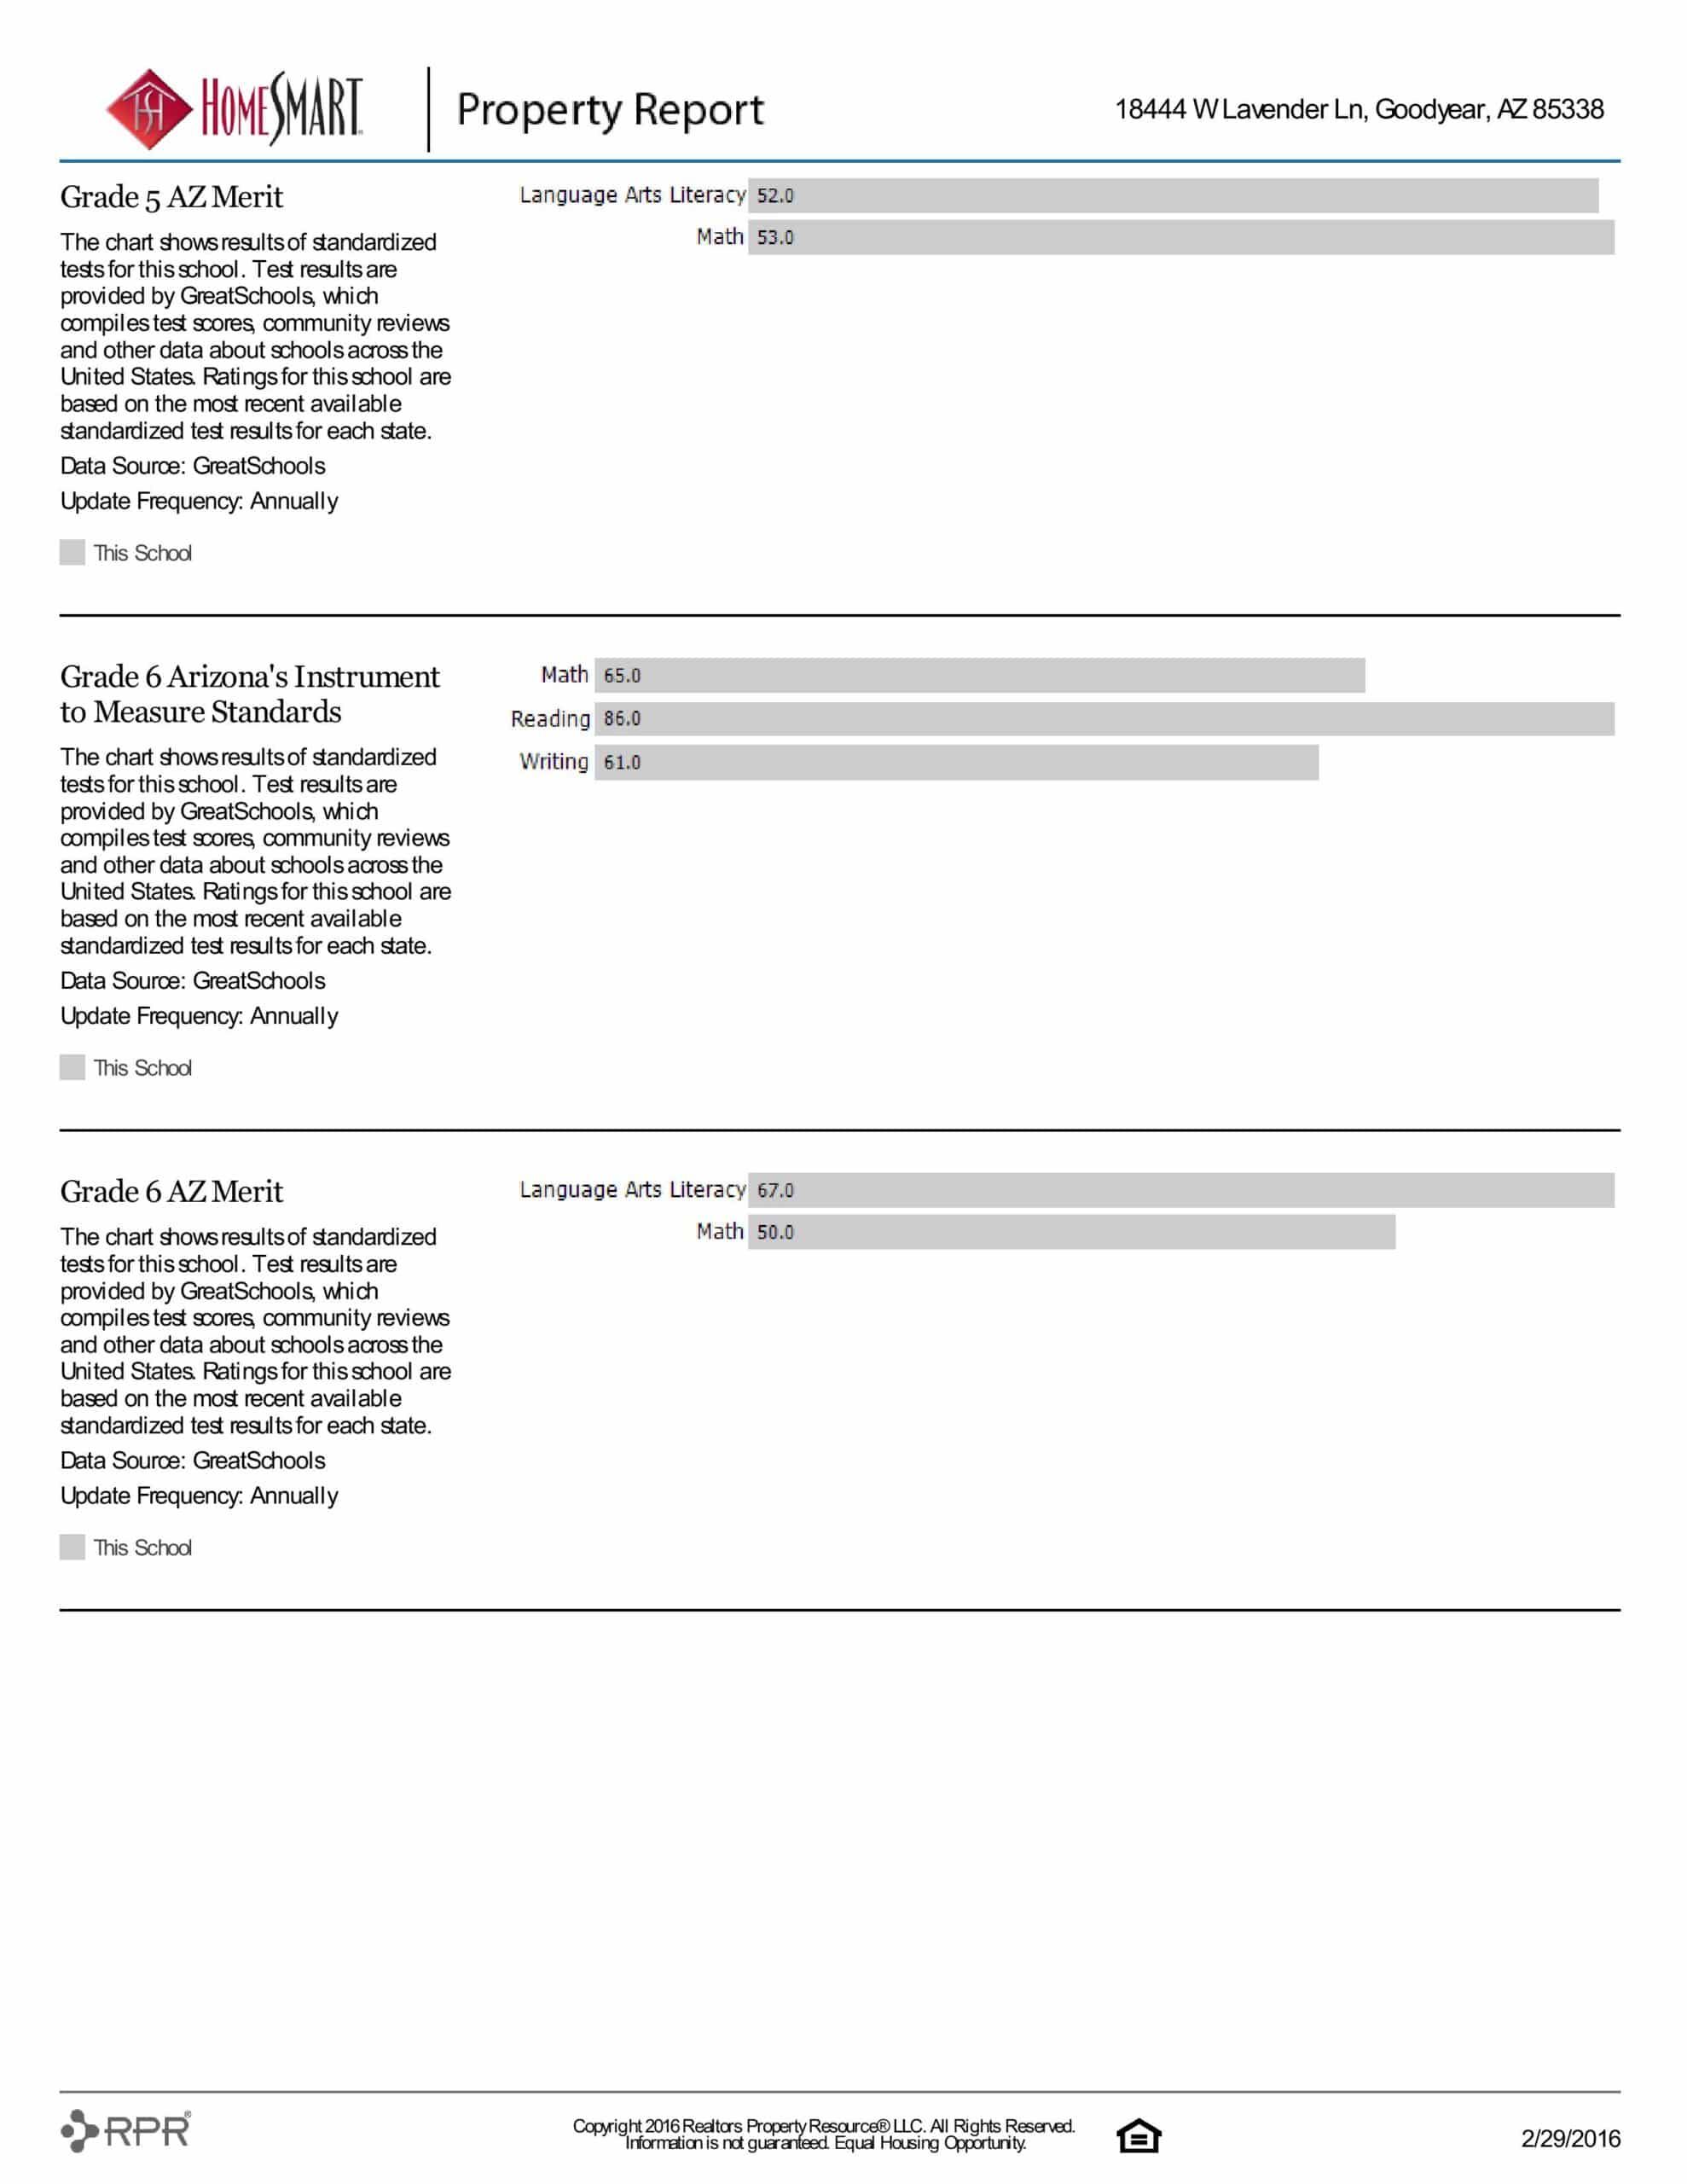 18444 W LAVENDER LN PROPERTY REPORT-page-032